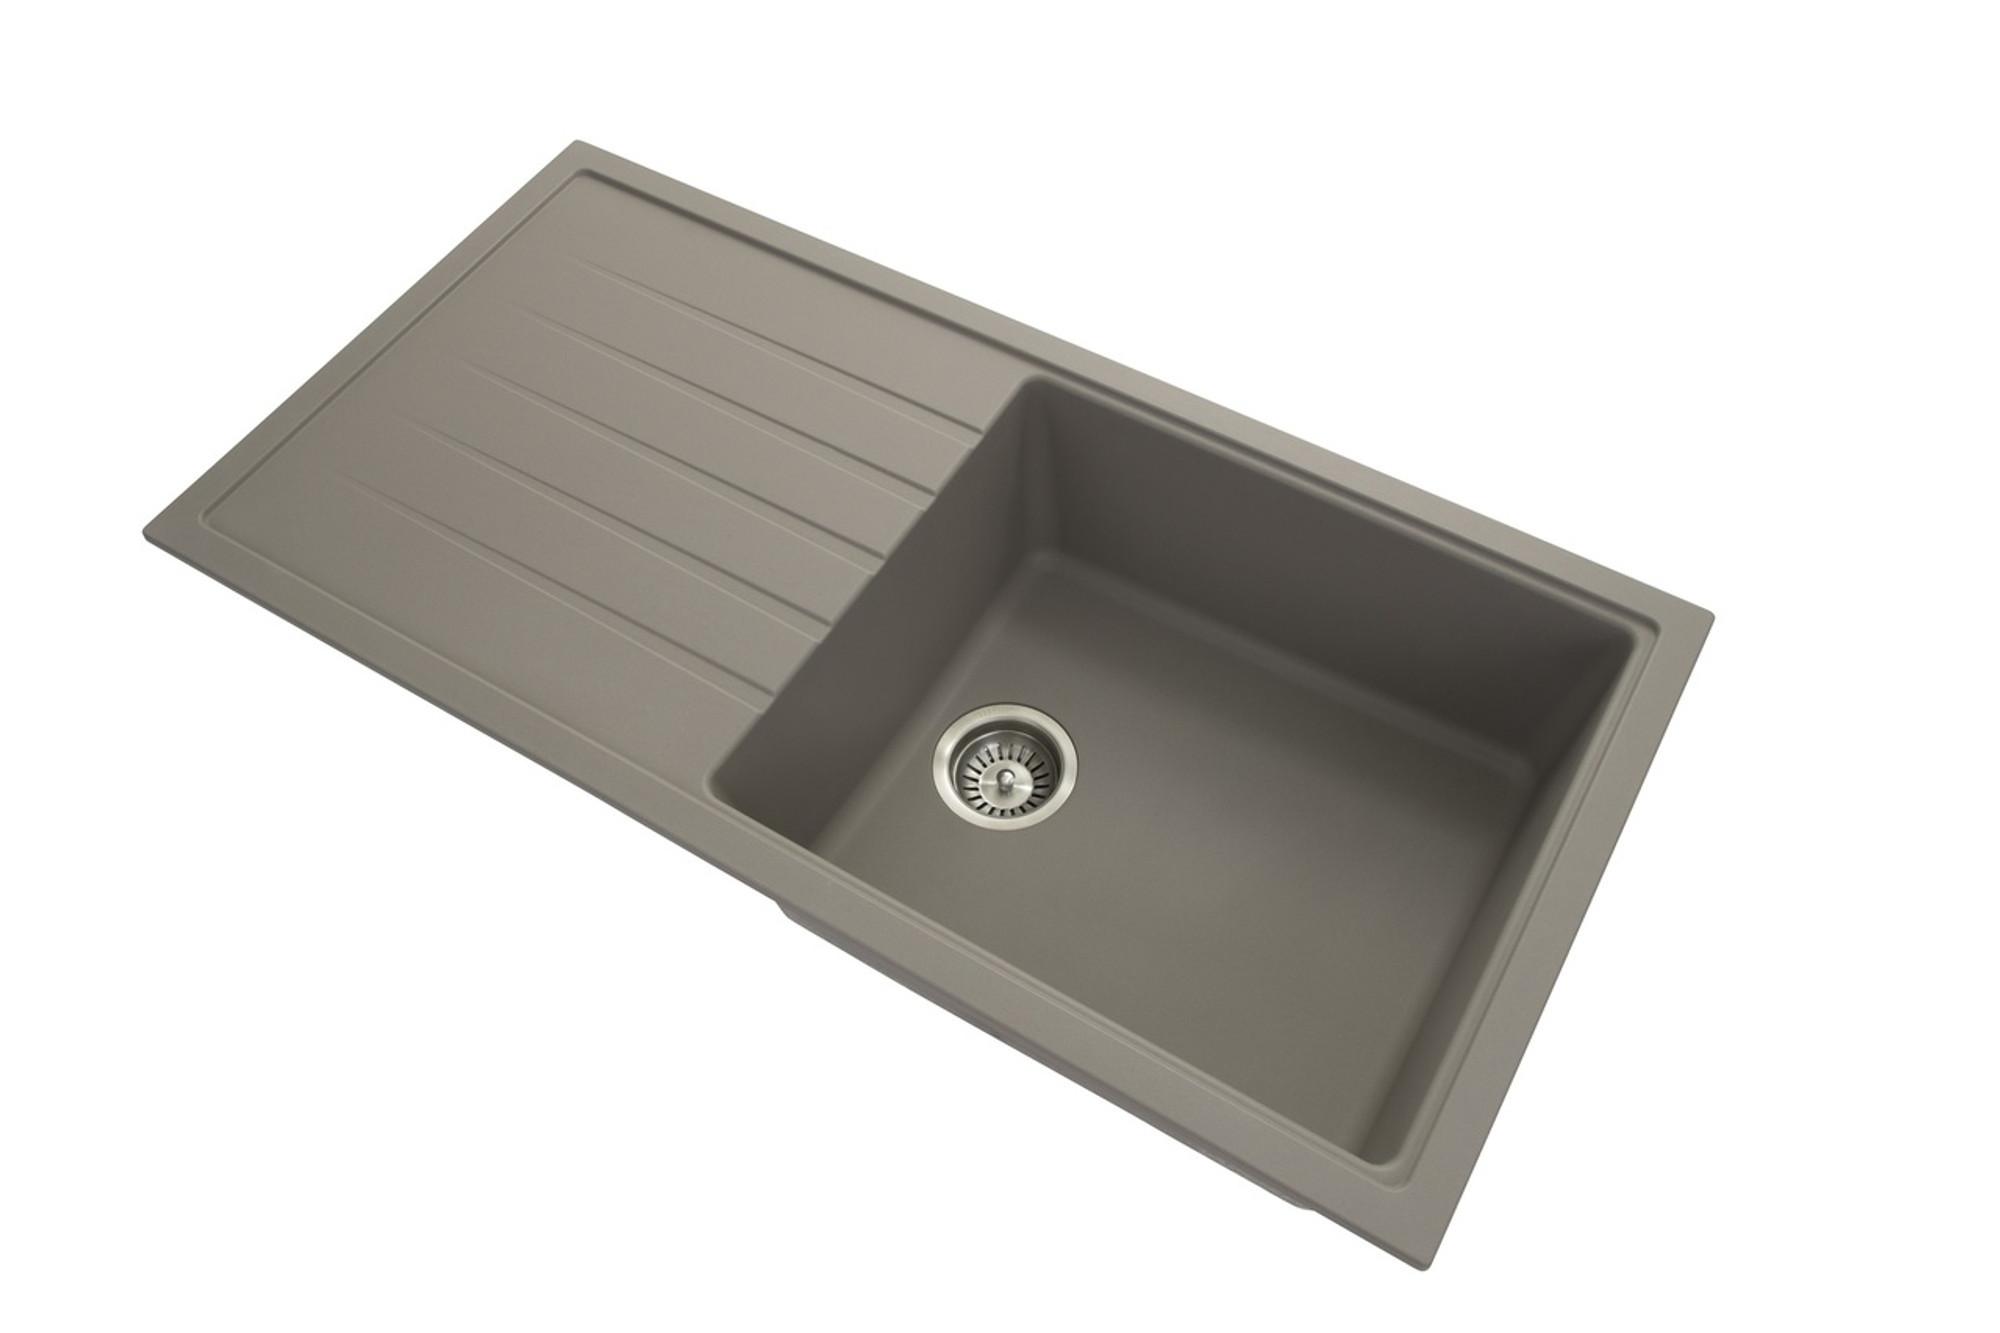 Carysil granite kitchen sink drop in or under mount single bowl drainer 1000